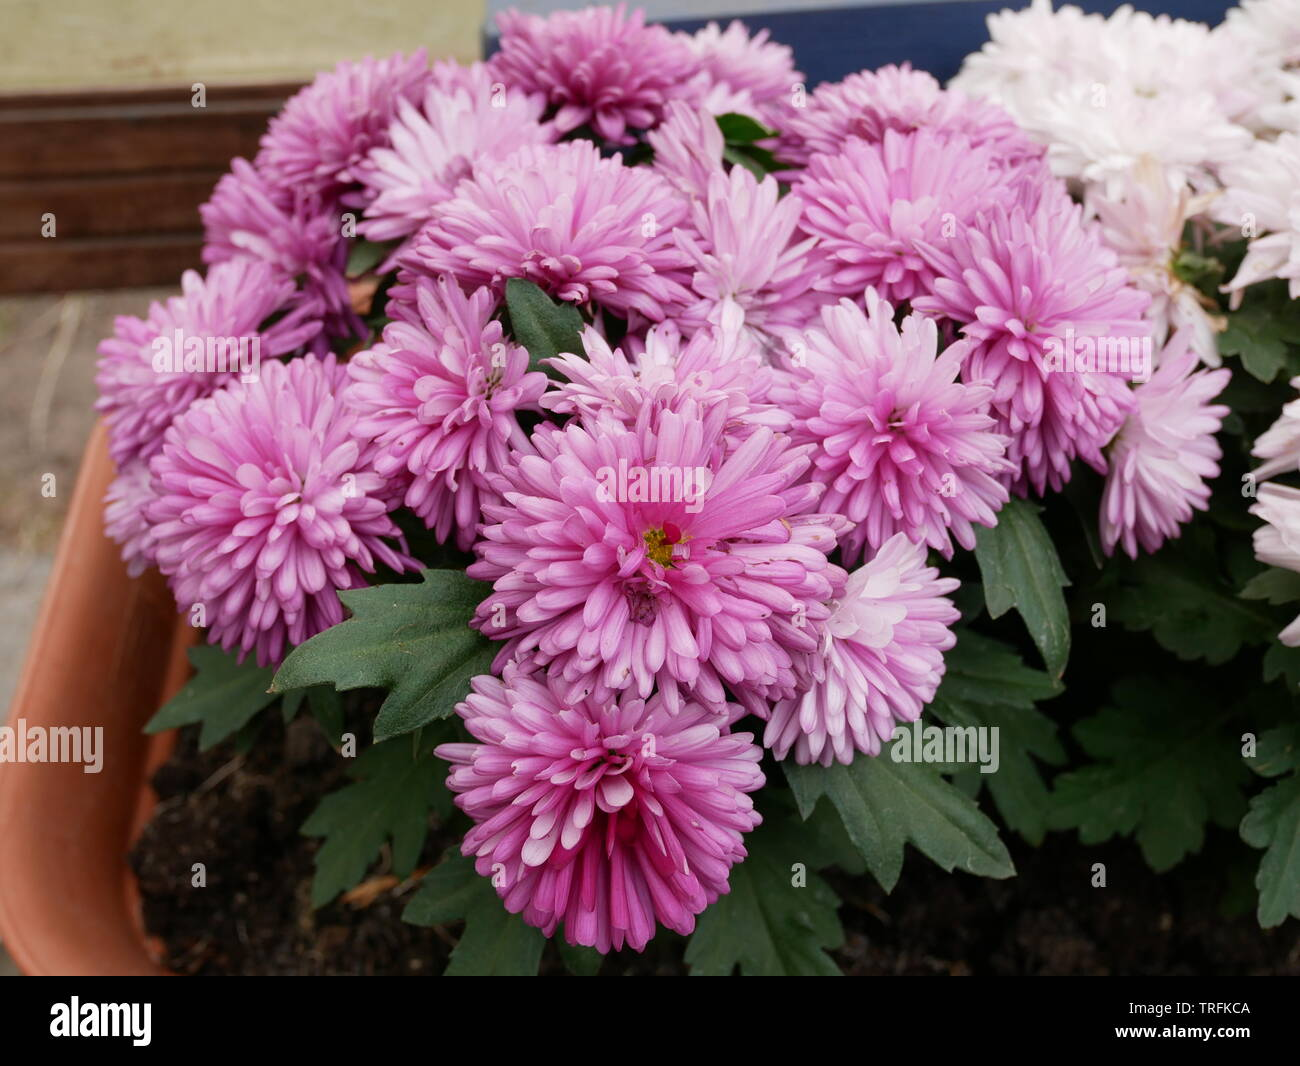 Blumen Pflanzen Grün Garten Topf - Stock Image